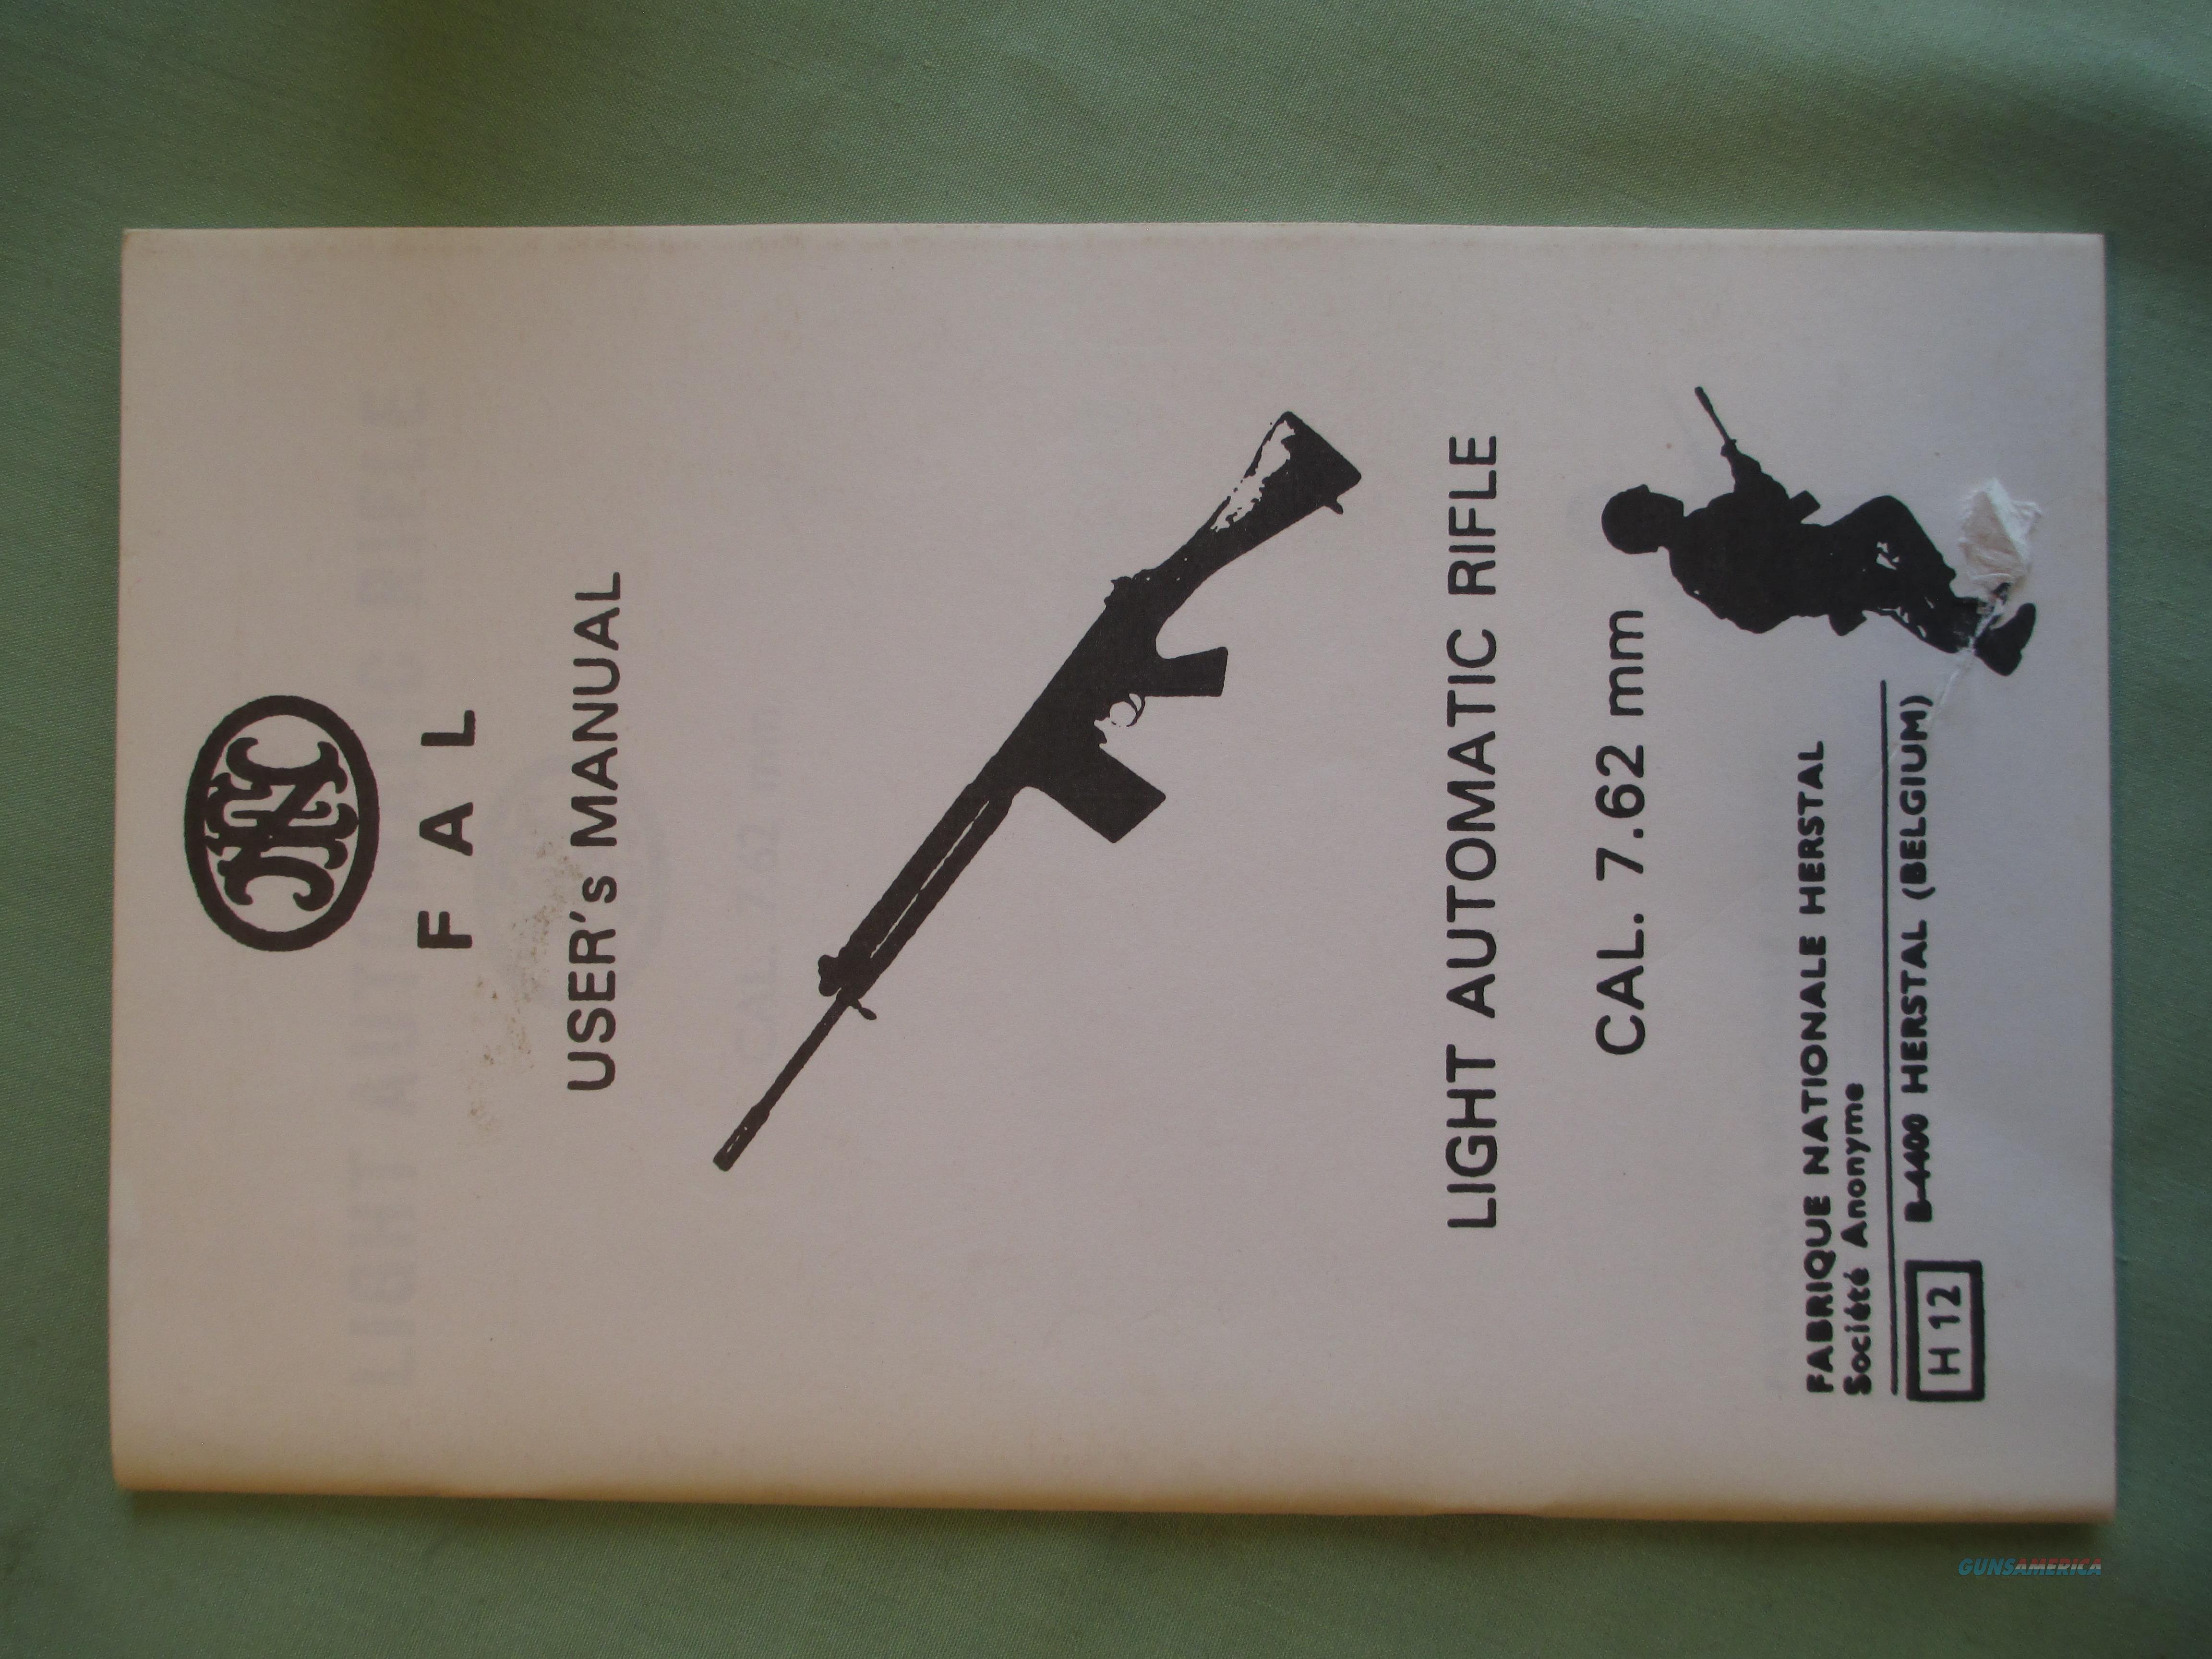 FN FAL Light Automatic Rifle Caliber 7.62mm User's Operator Manual Book   Non-Guns > Gun Parts > Military - Foreign